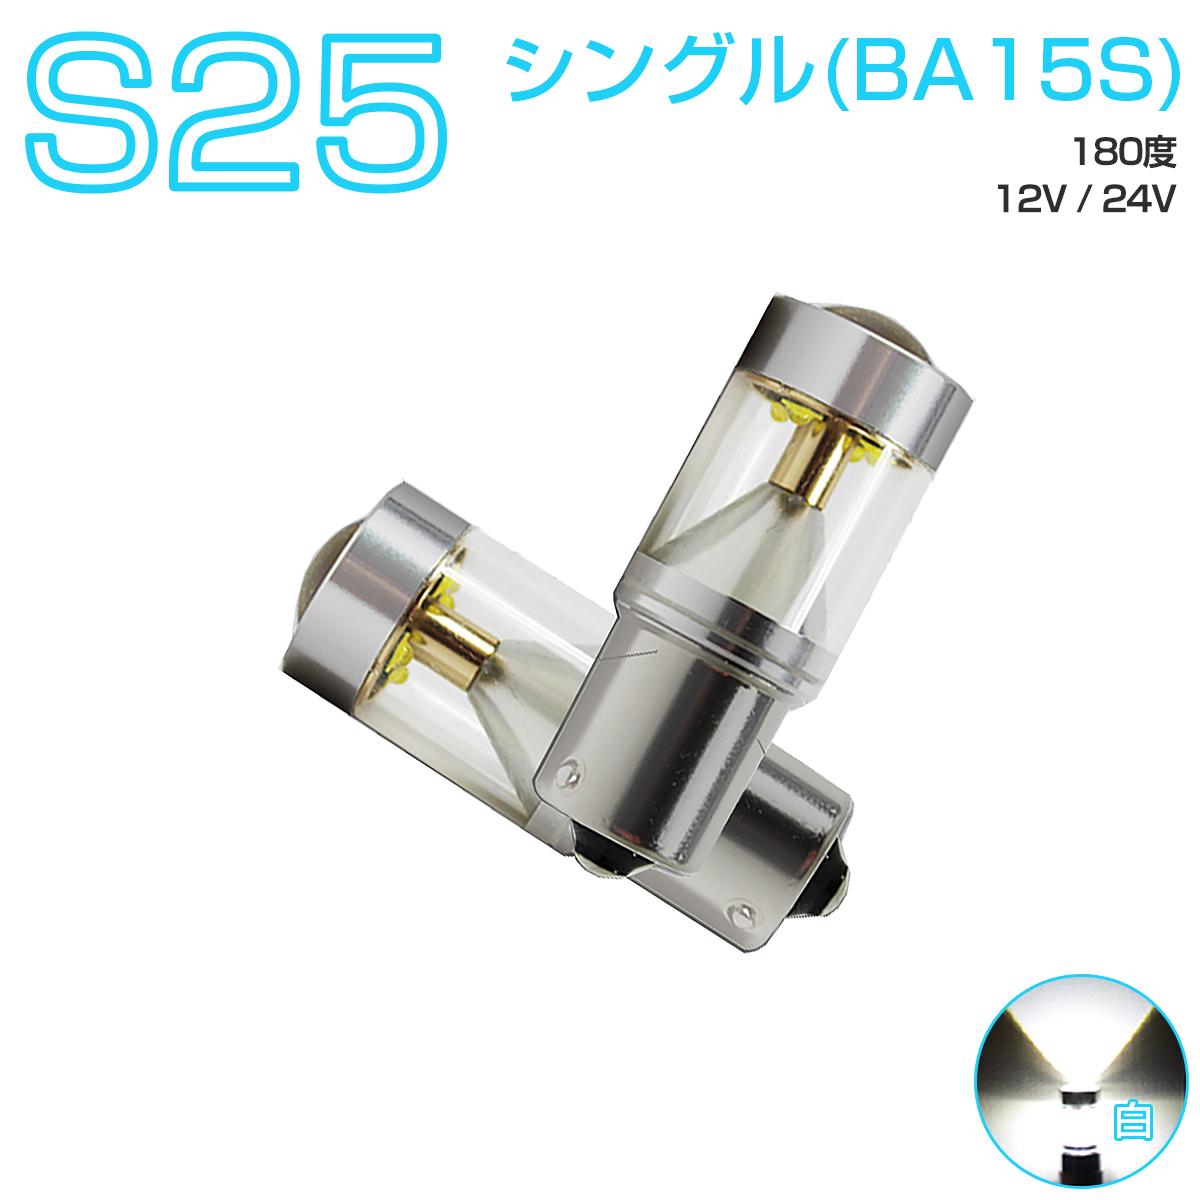 LED S25シングルBA15S ホワイト白発光 30W CREEチップ フォグランプ ブレーキ ウインカー バックランプ 2個入り 12V 24V SDM便送料無料 1年保証